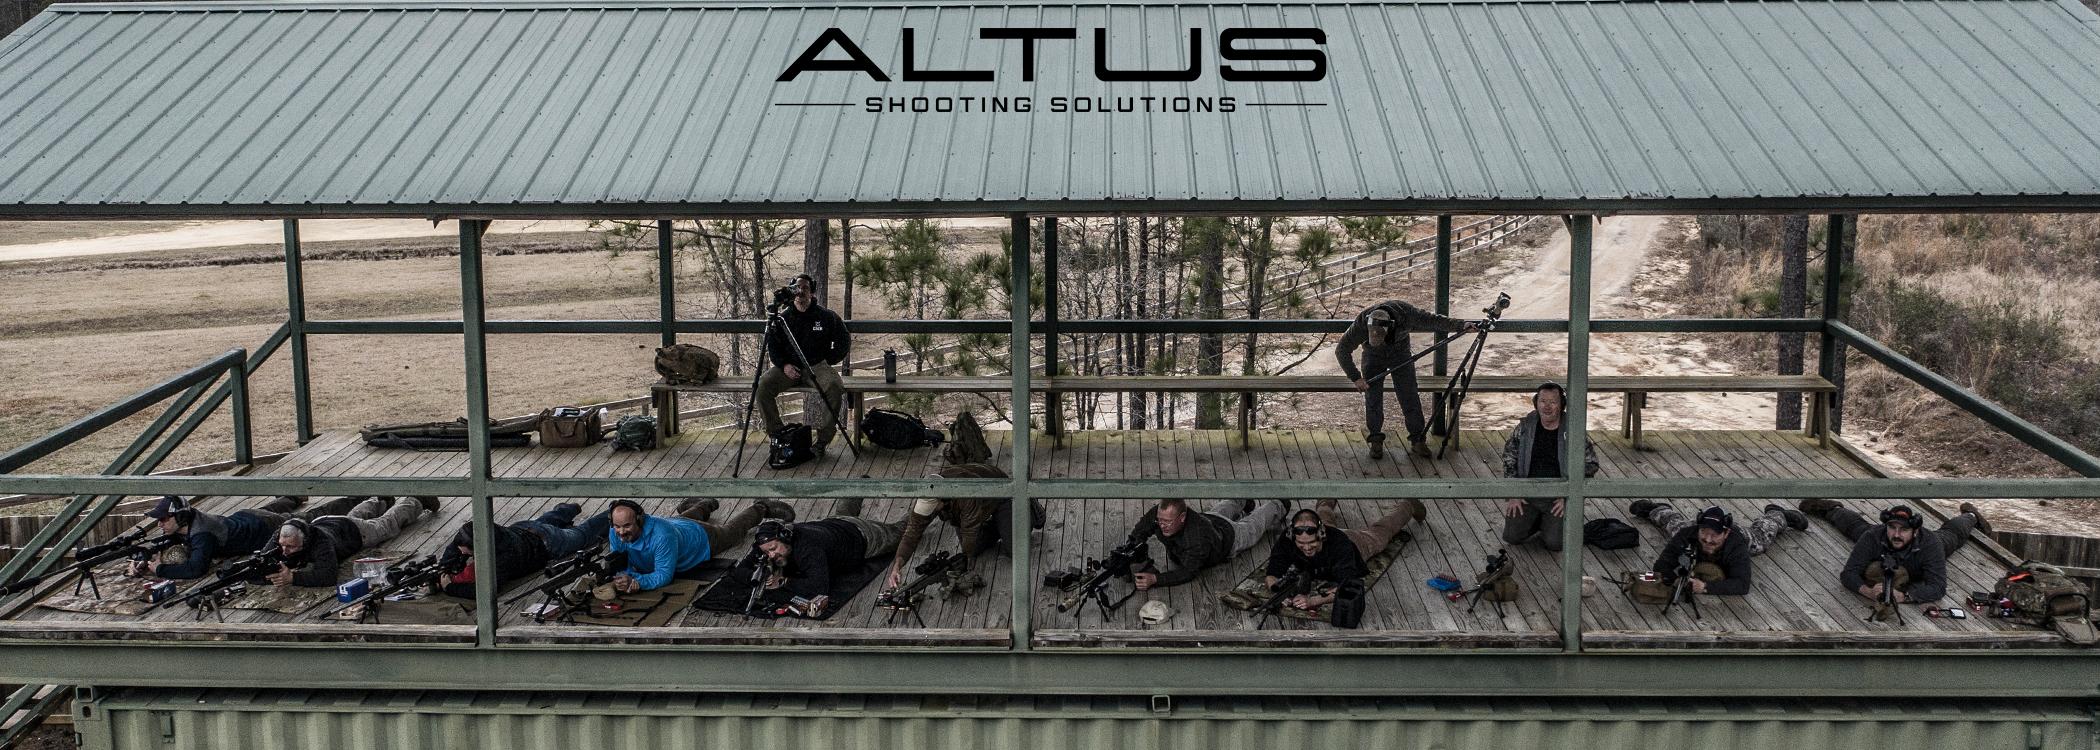 altus-training-collection-photo.jpg